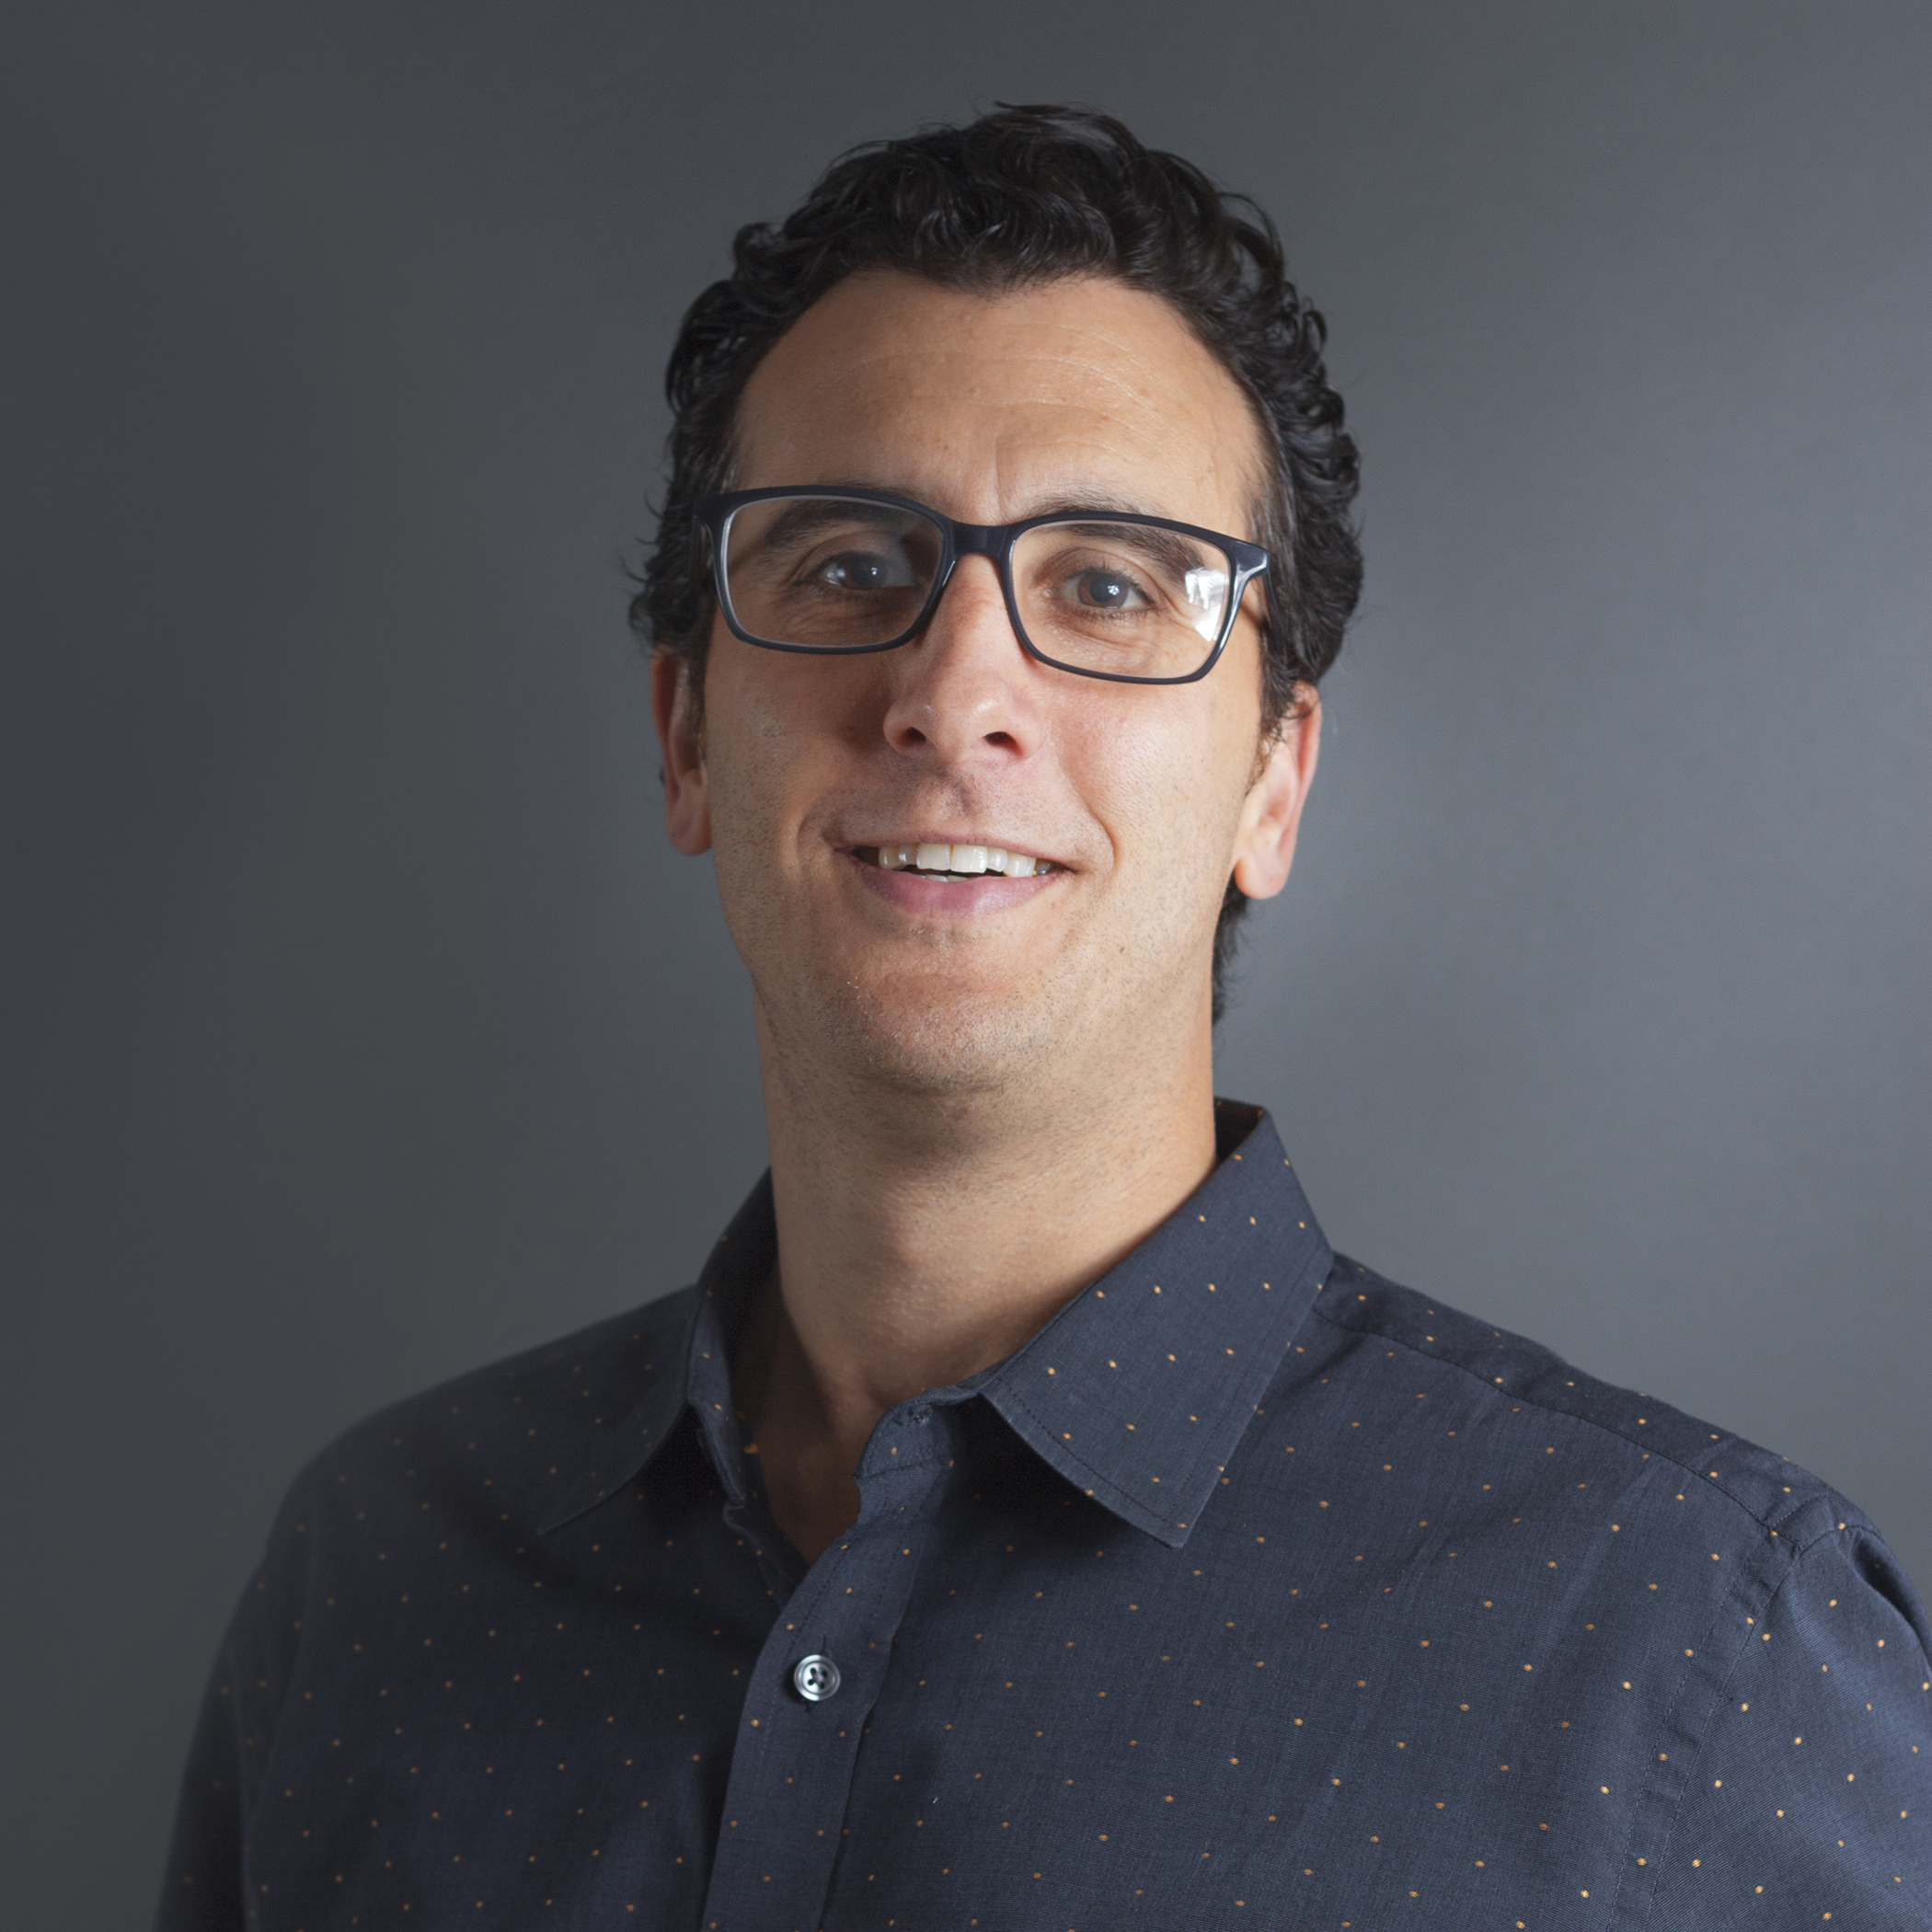 Adam Pierno